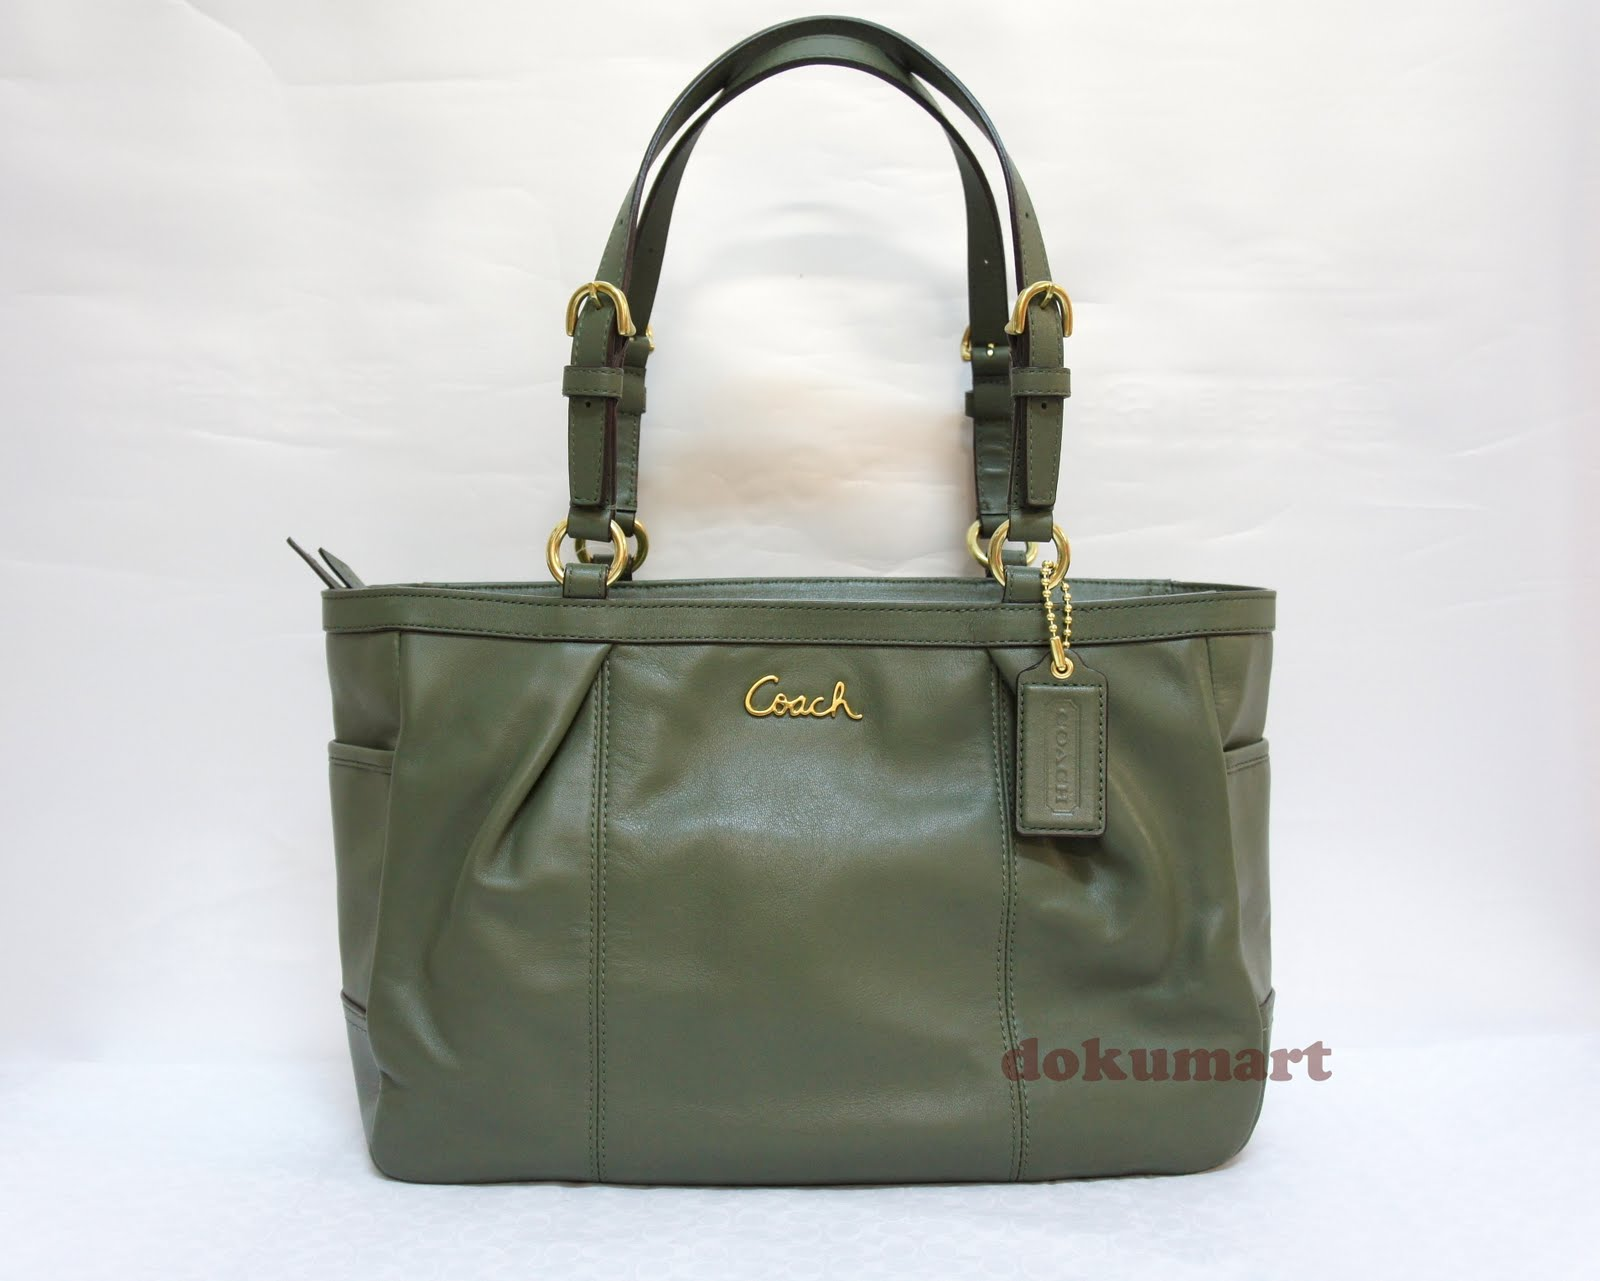 d073899d0aa1 ... purse coach book bag 0144a 73067  top quality coach gallery leather ew  tote 17721 green 05f5b 07c84